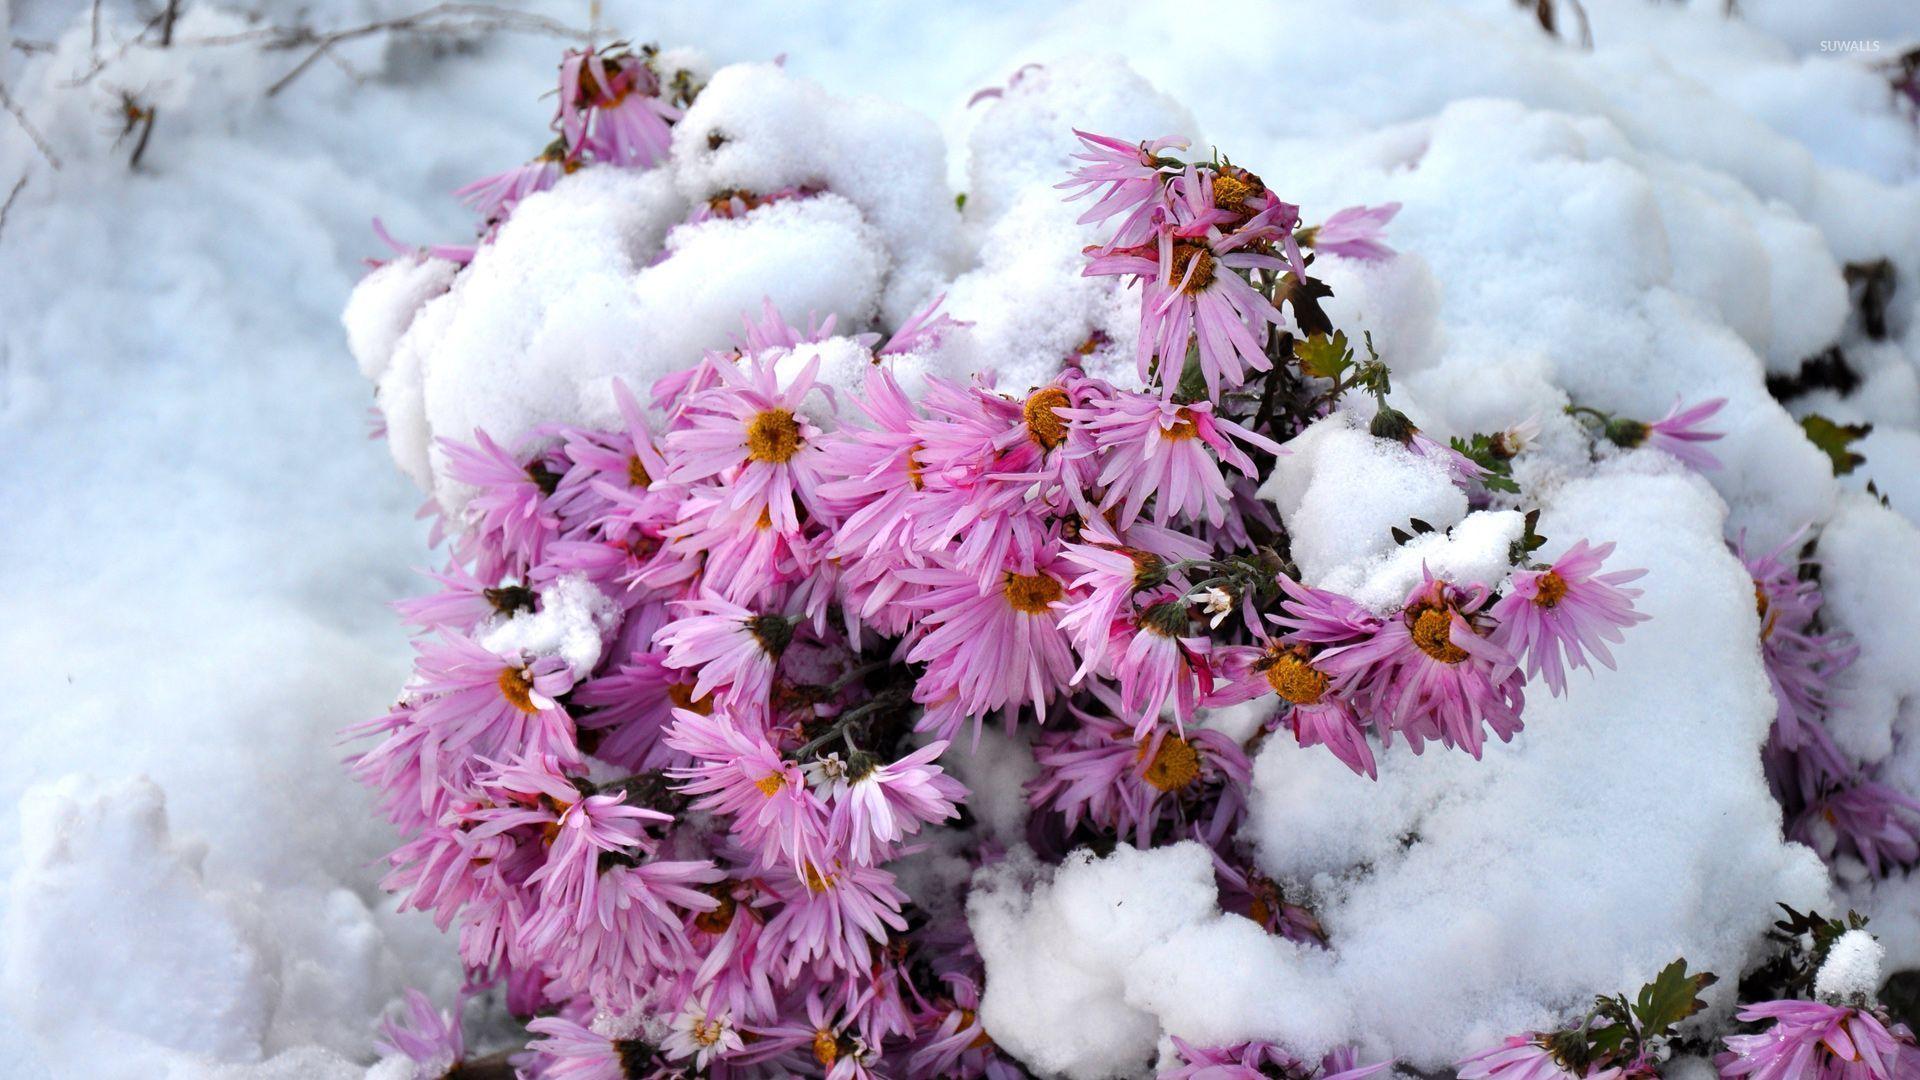 Pink Chrysanthemum Under The Snow Wallpaper Flower